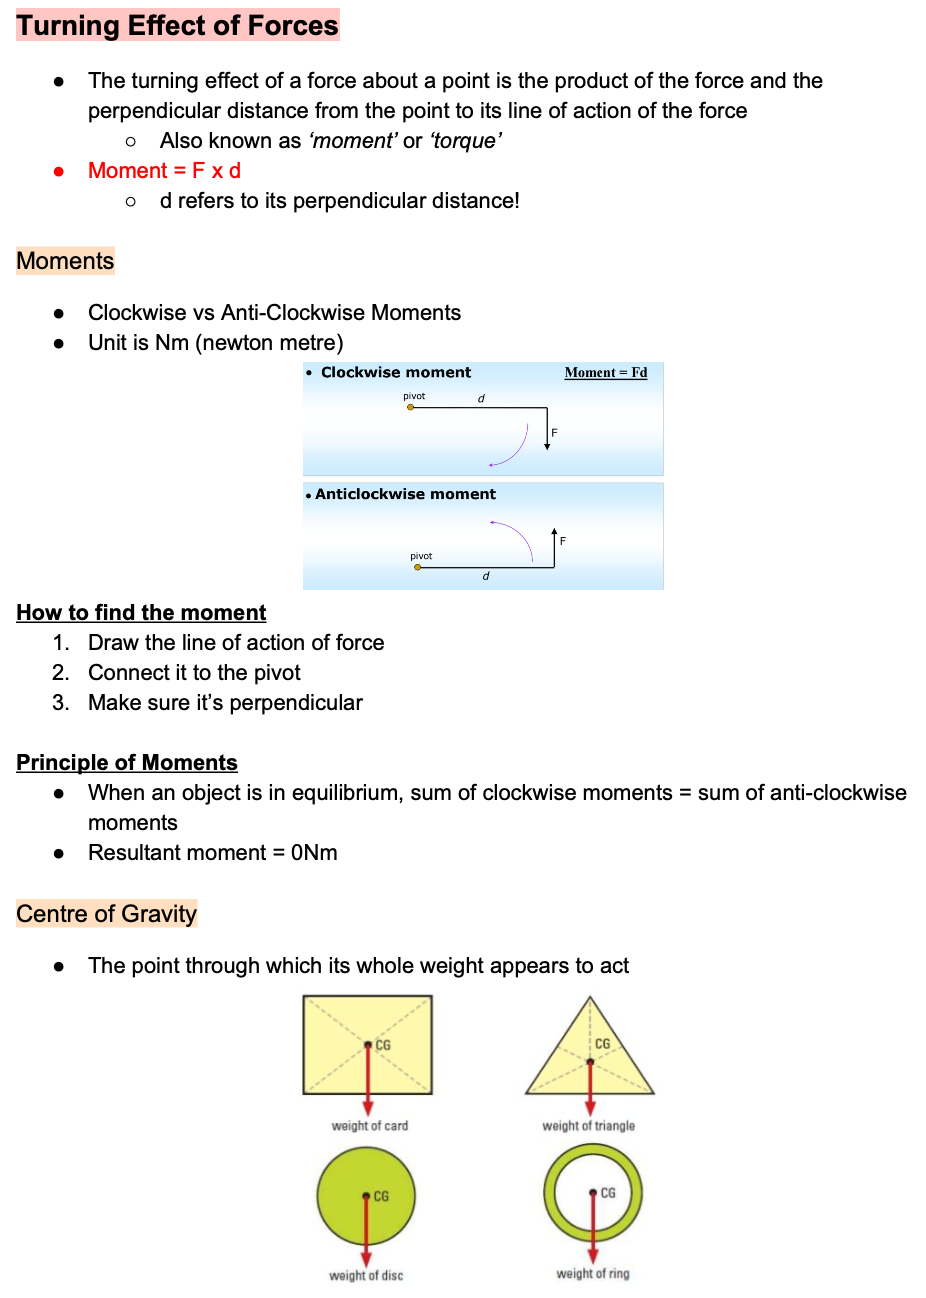 RGS Sec 3 Physics Notes (Ashley & Vivien)